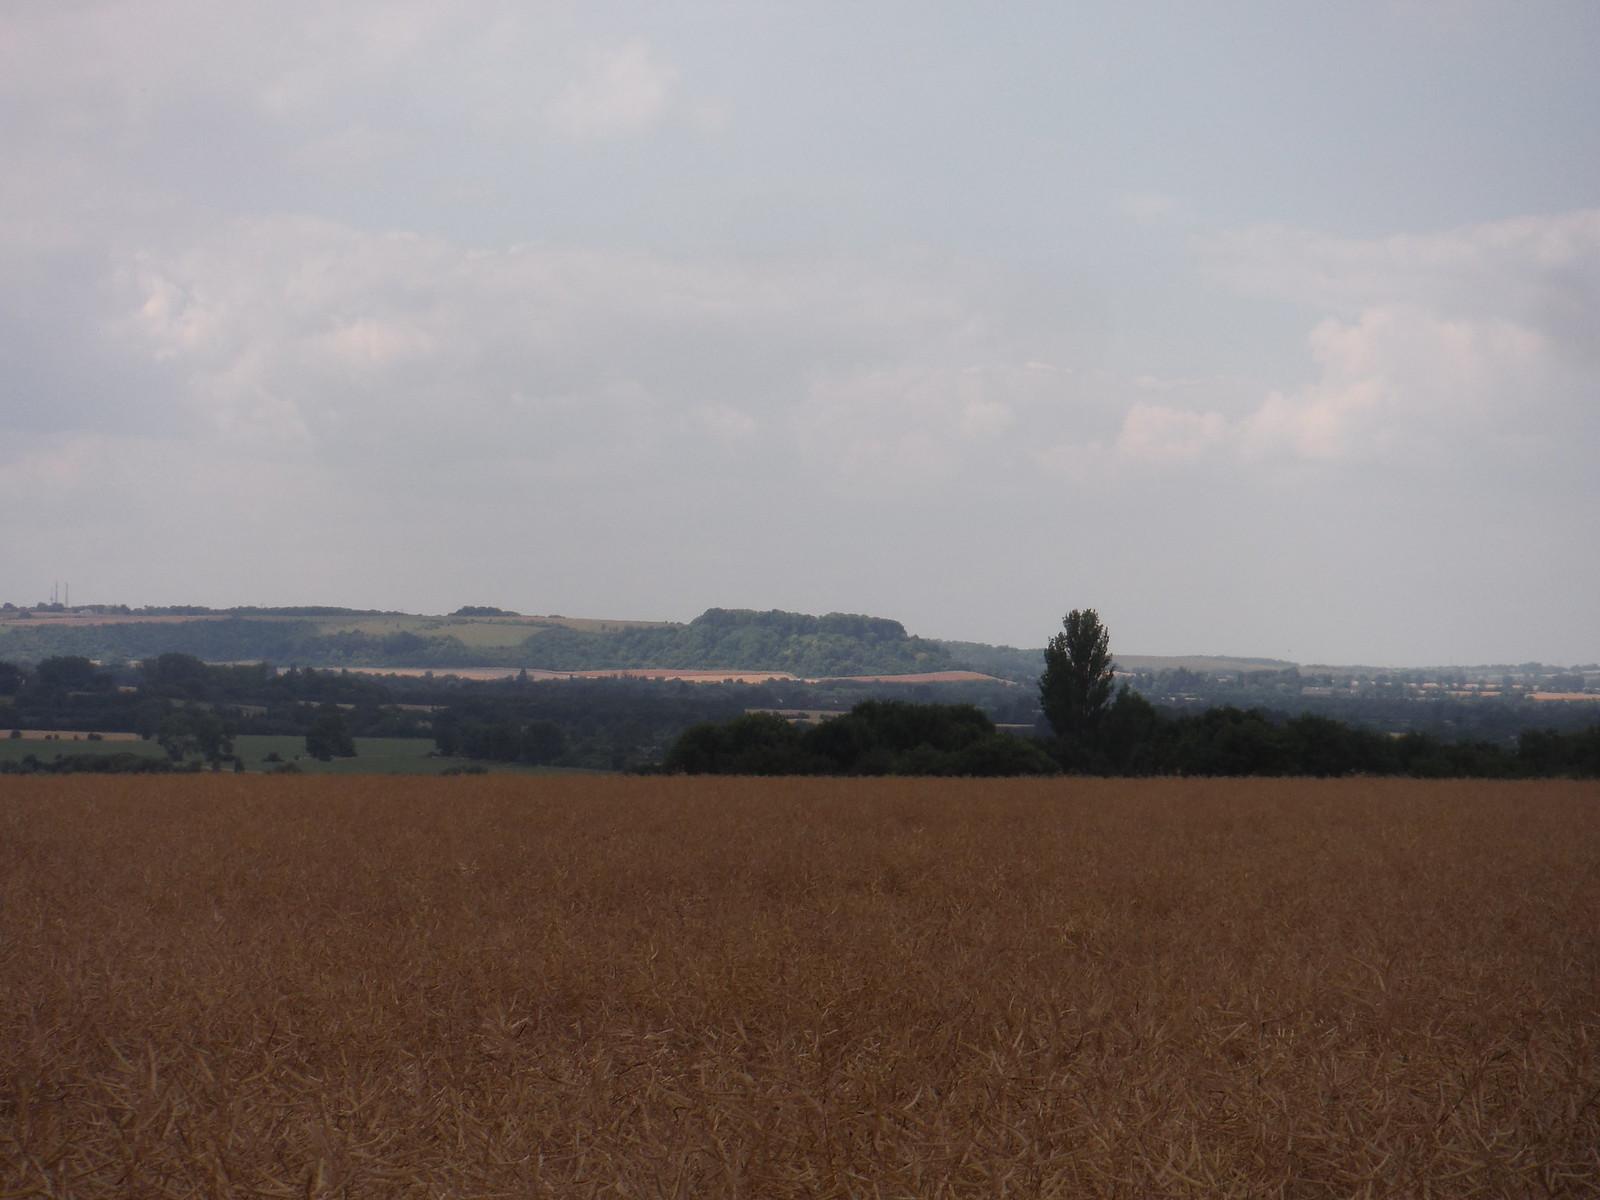 Sharpenhoe Iron Age Hillfort Site SWC Walk 233 - Arlesey to Letchworth Garden City